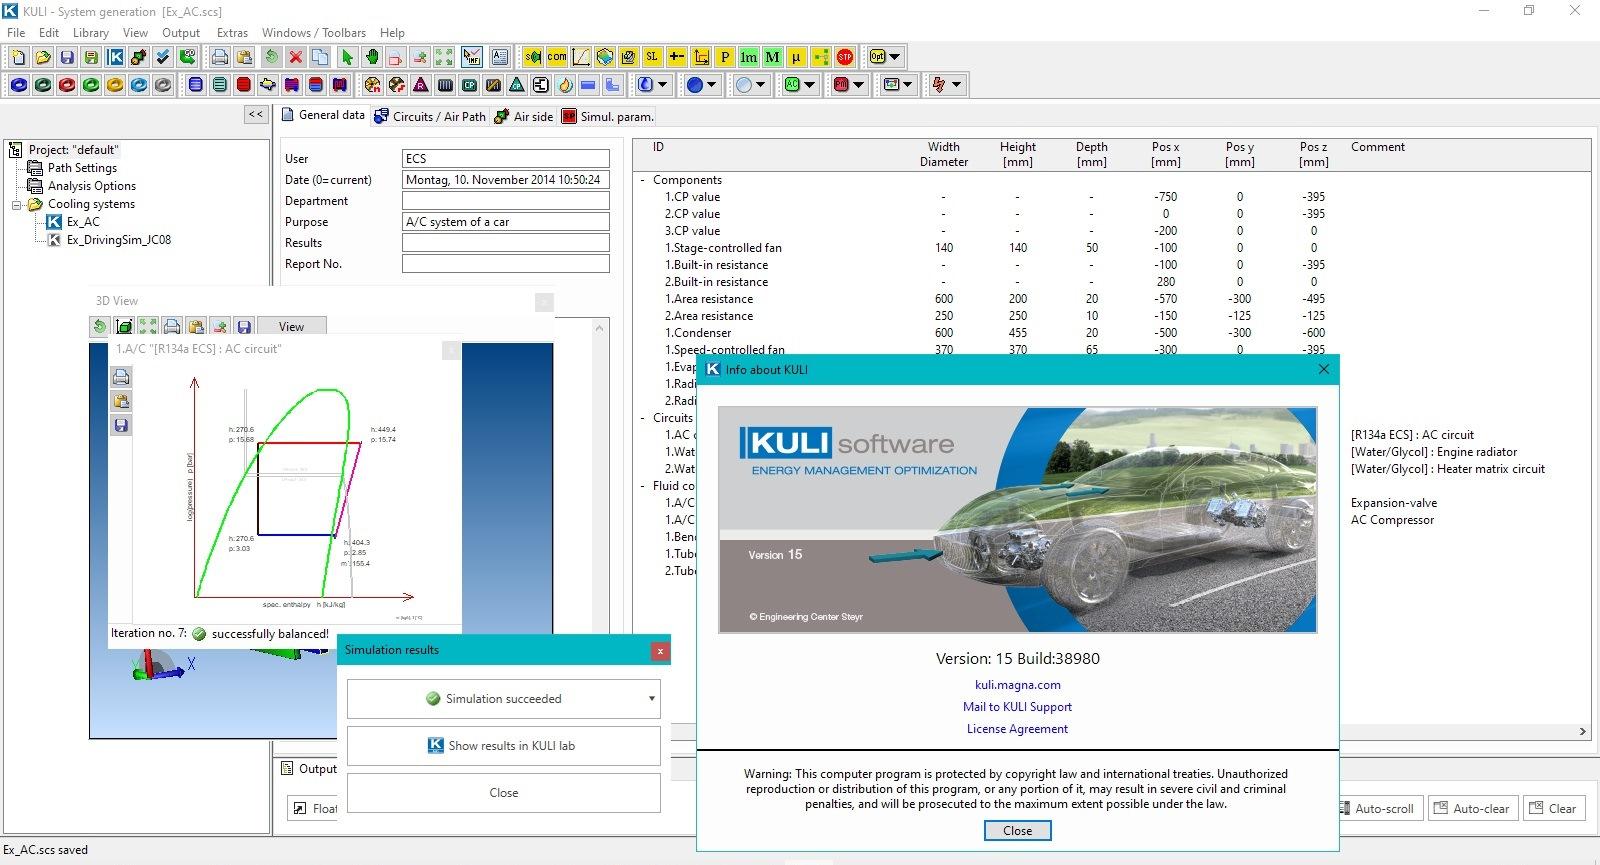 Working with MAGNA KULI 15.0 full